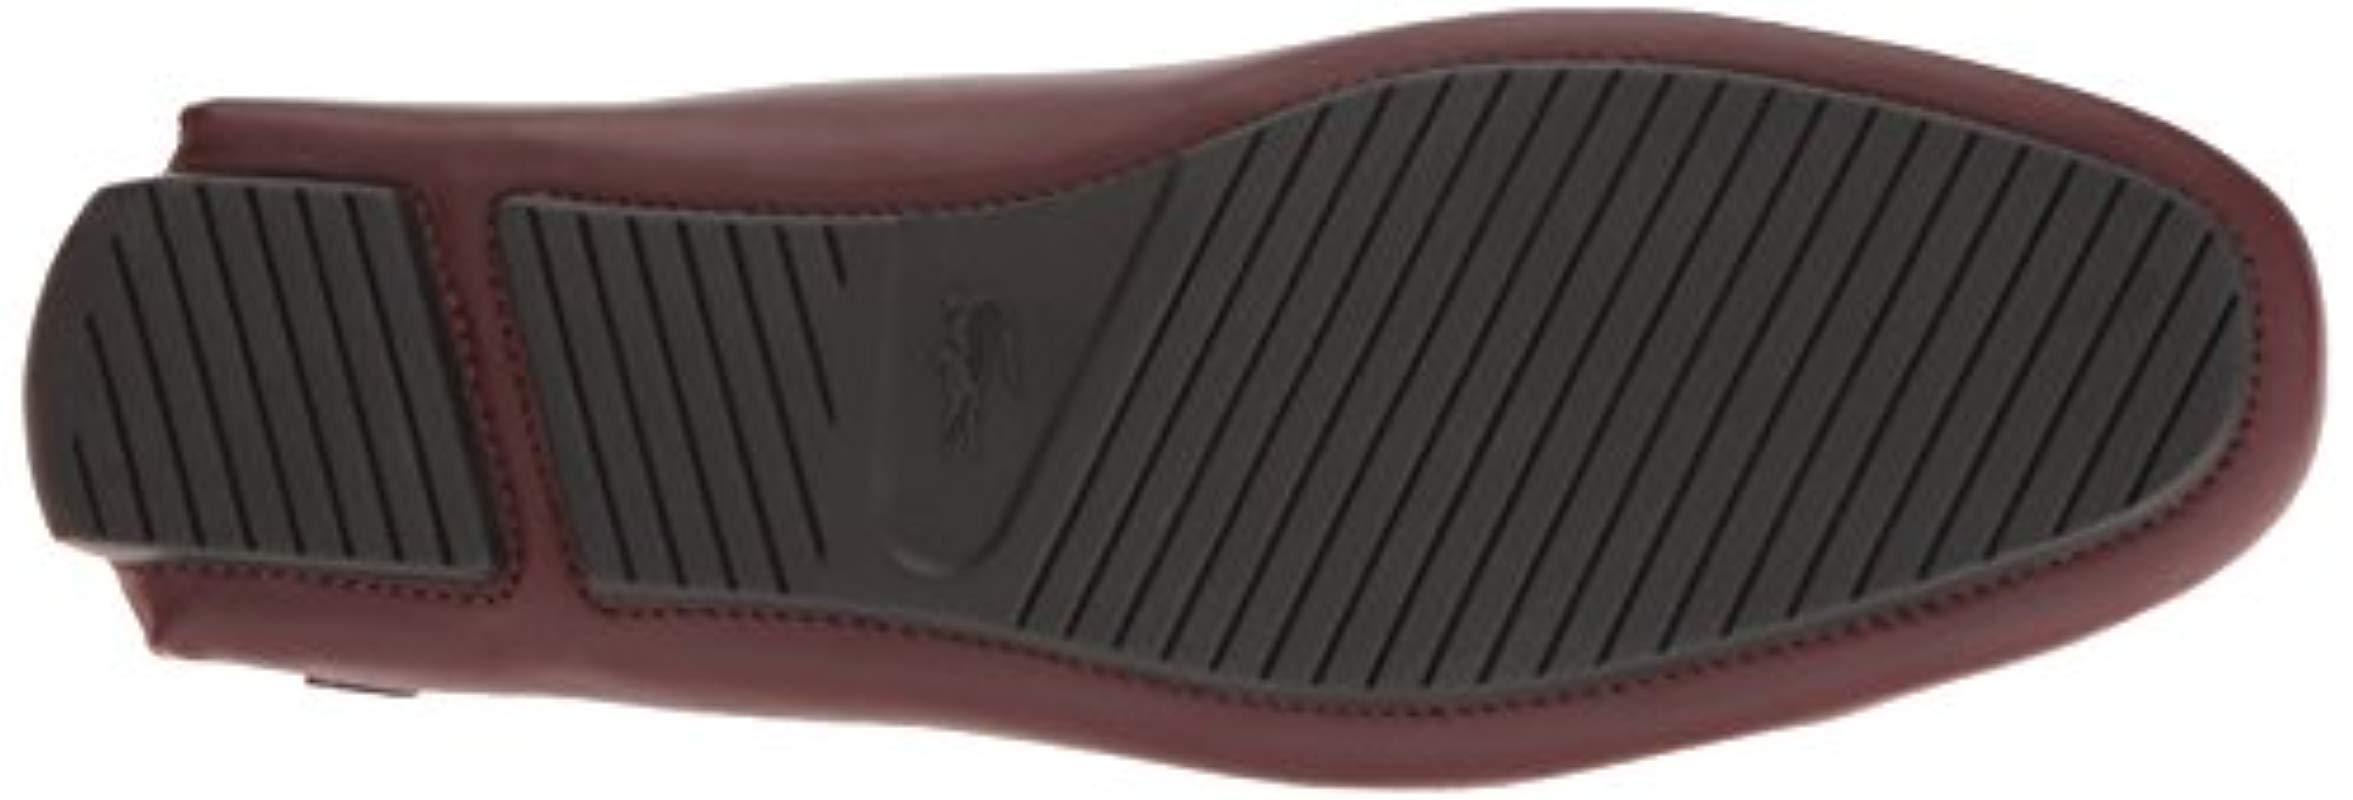 62da4c2a9c768b Lacoste - Brown Piloter 117 1 Formal Shoe Fashion Sneaker for Men - Lyst.  View fullscreen